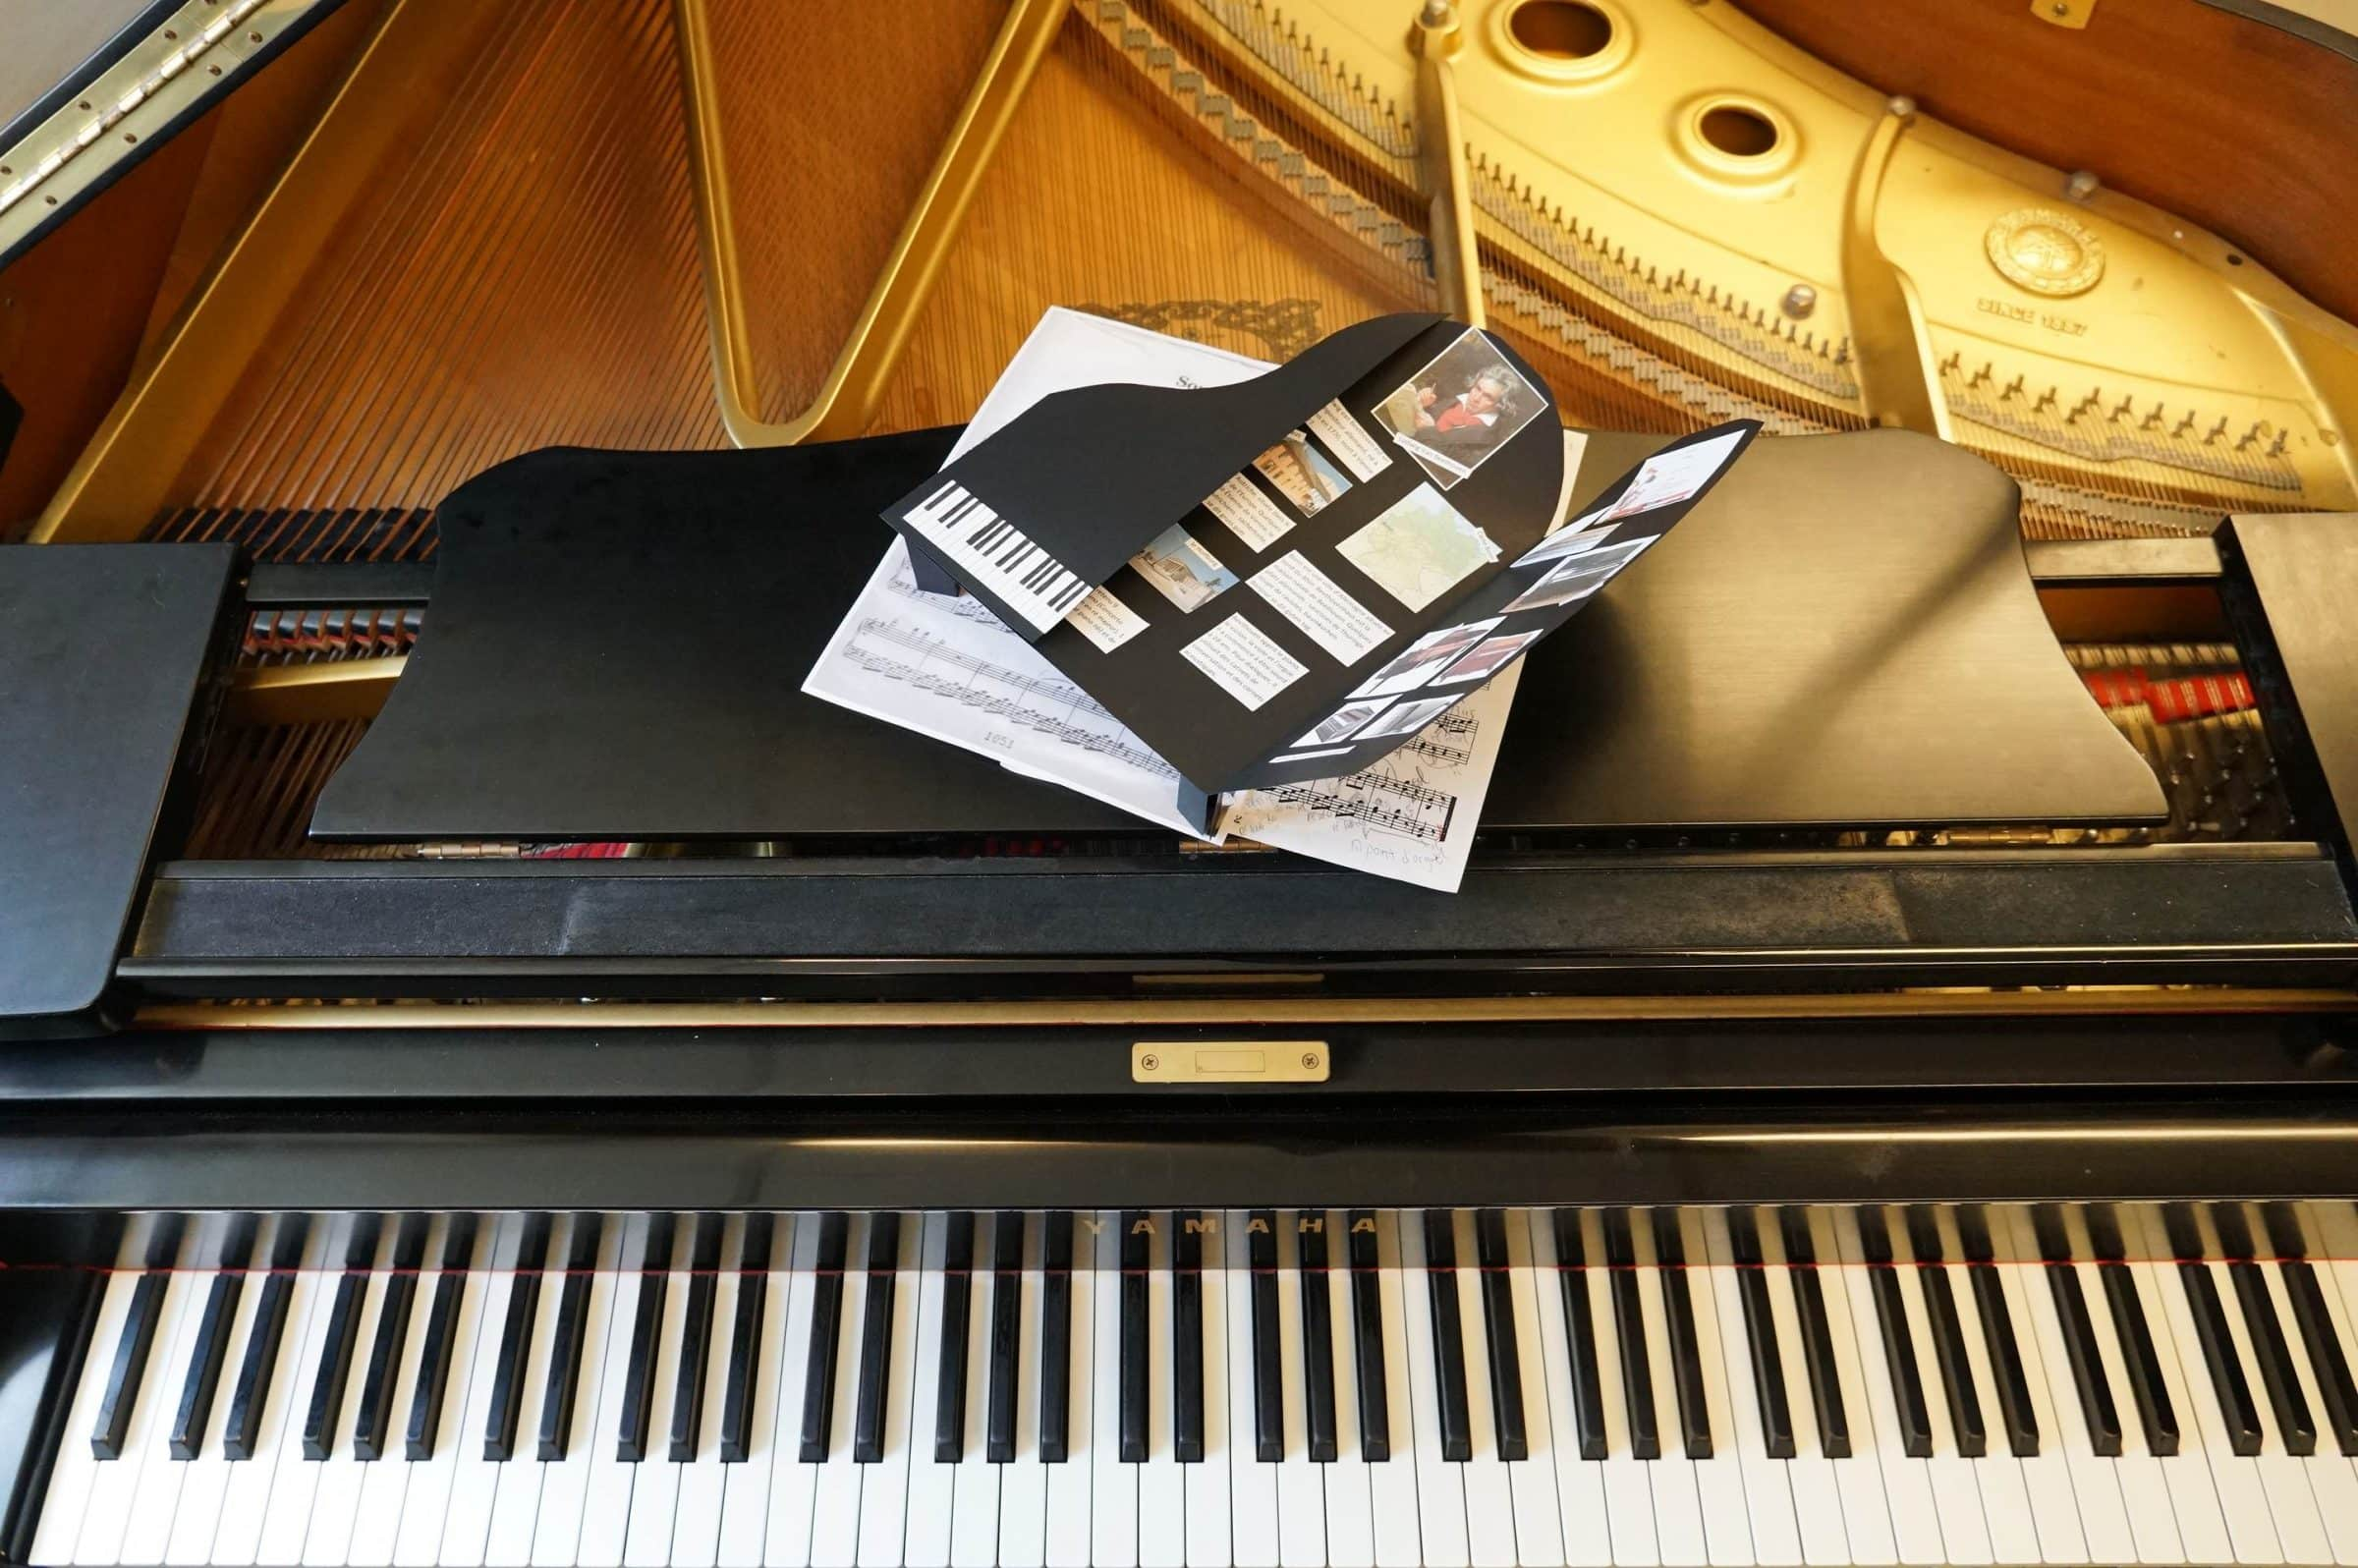 Beethoven piano lapbook